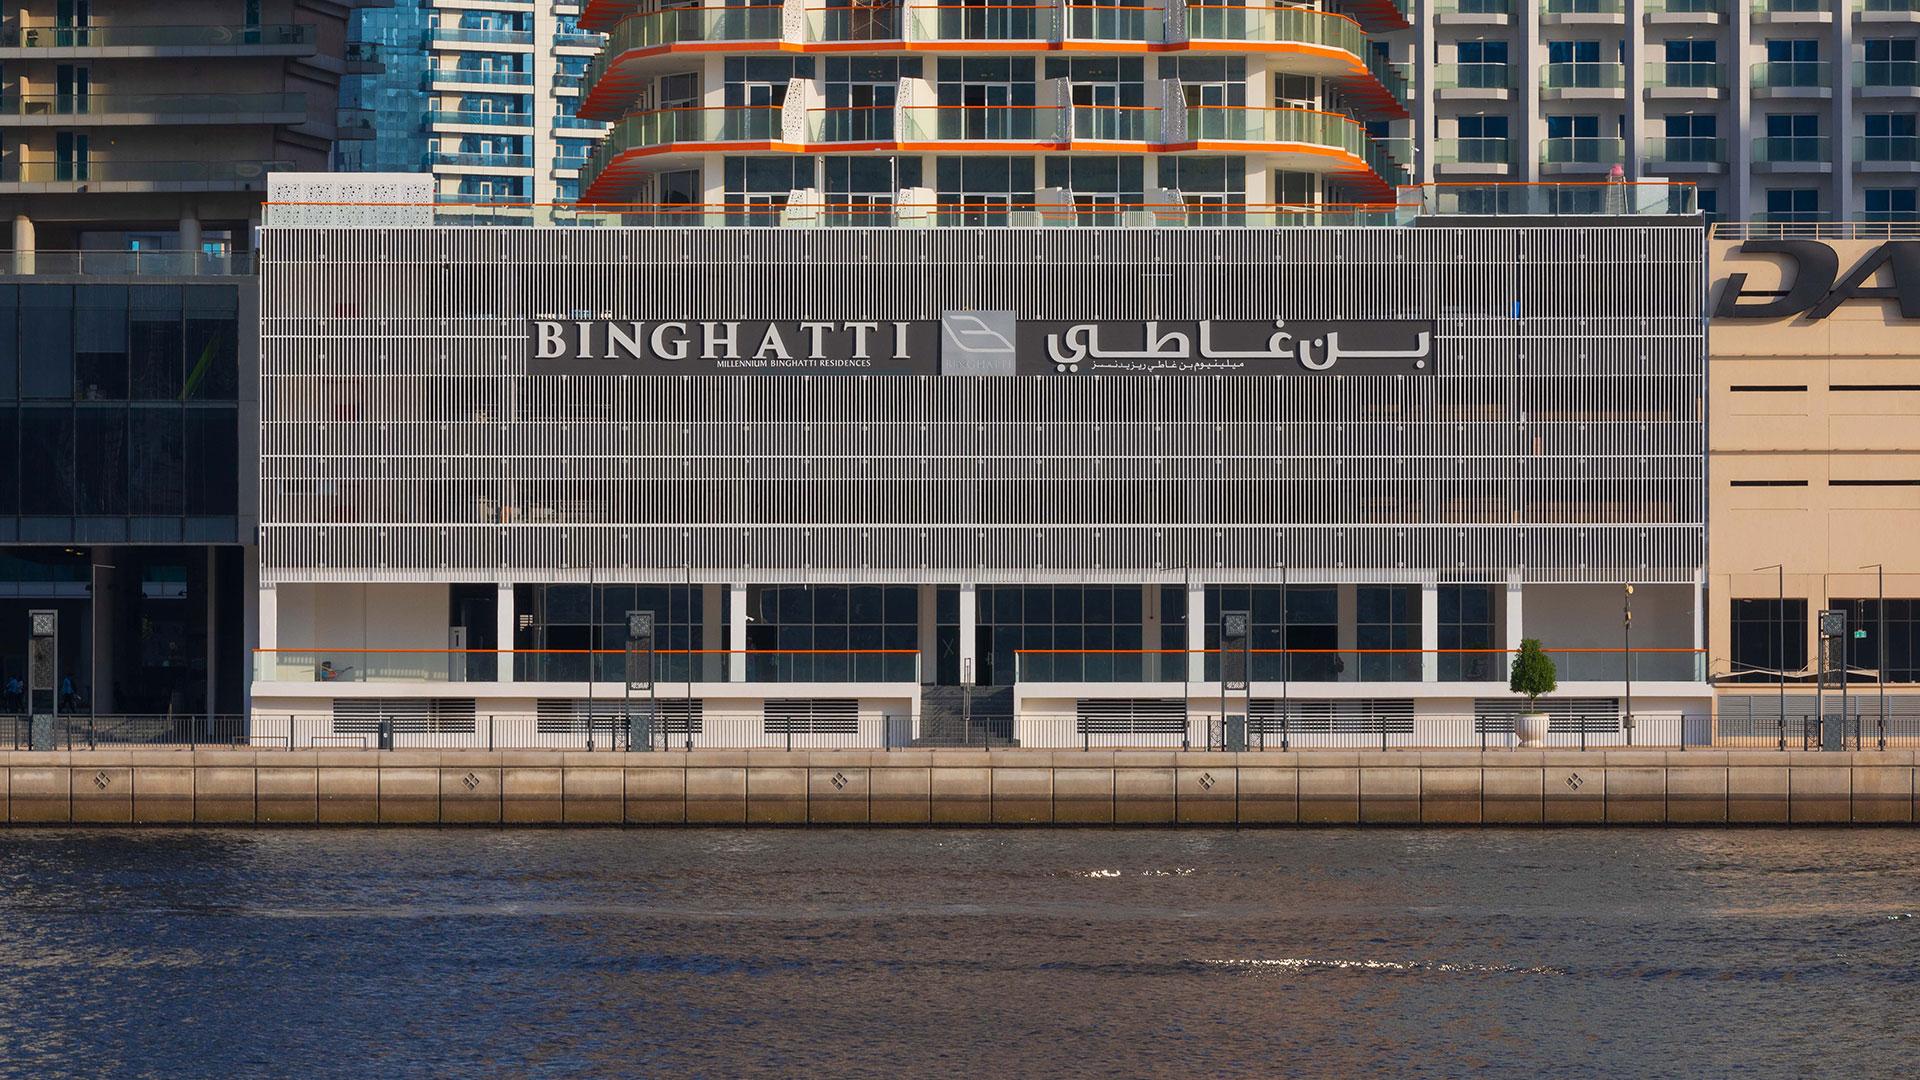 Binghatti